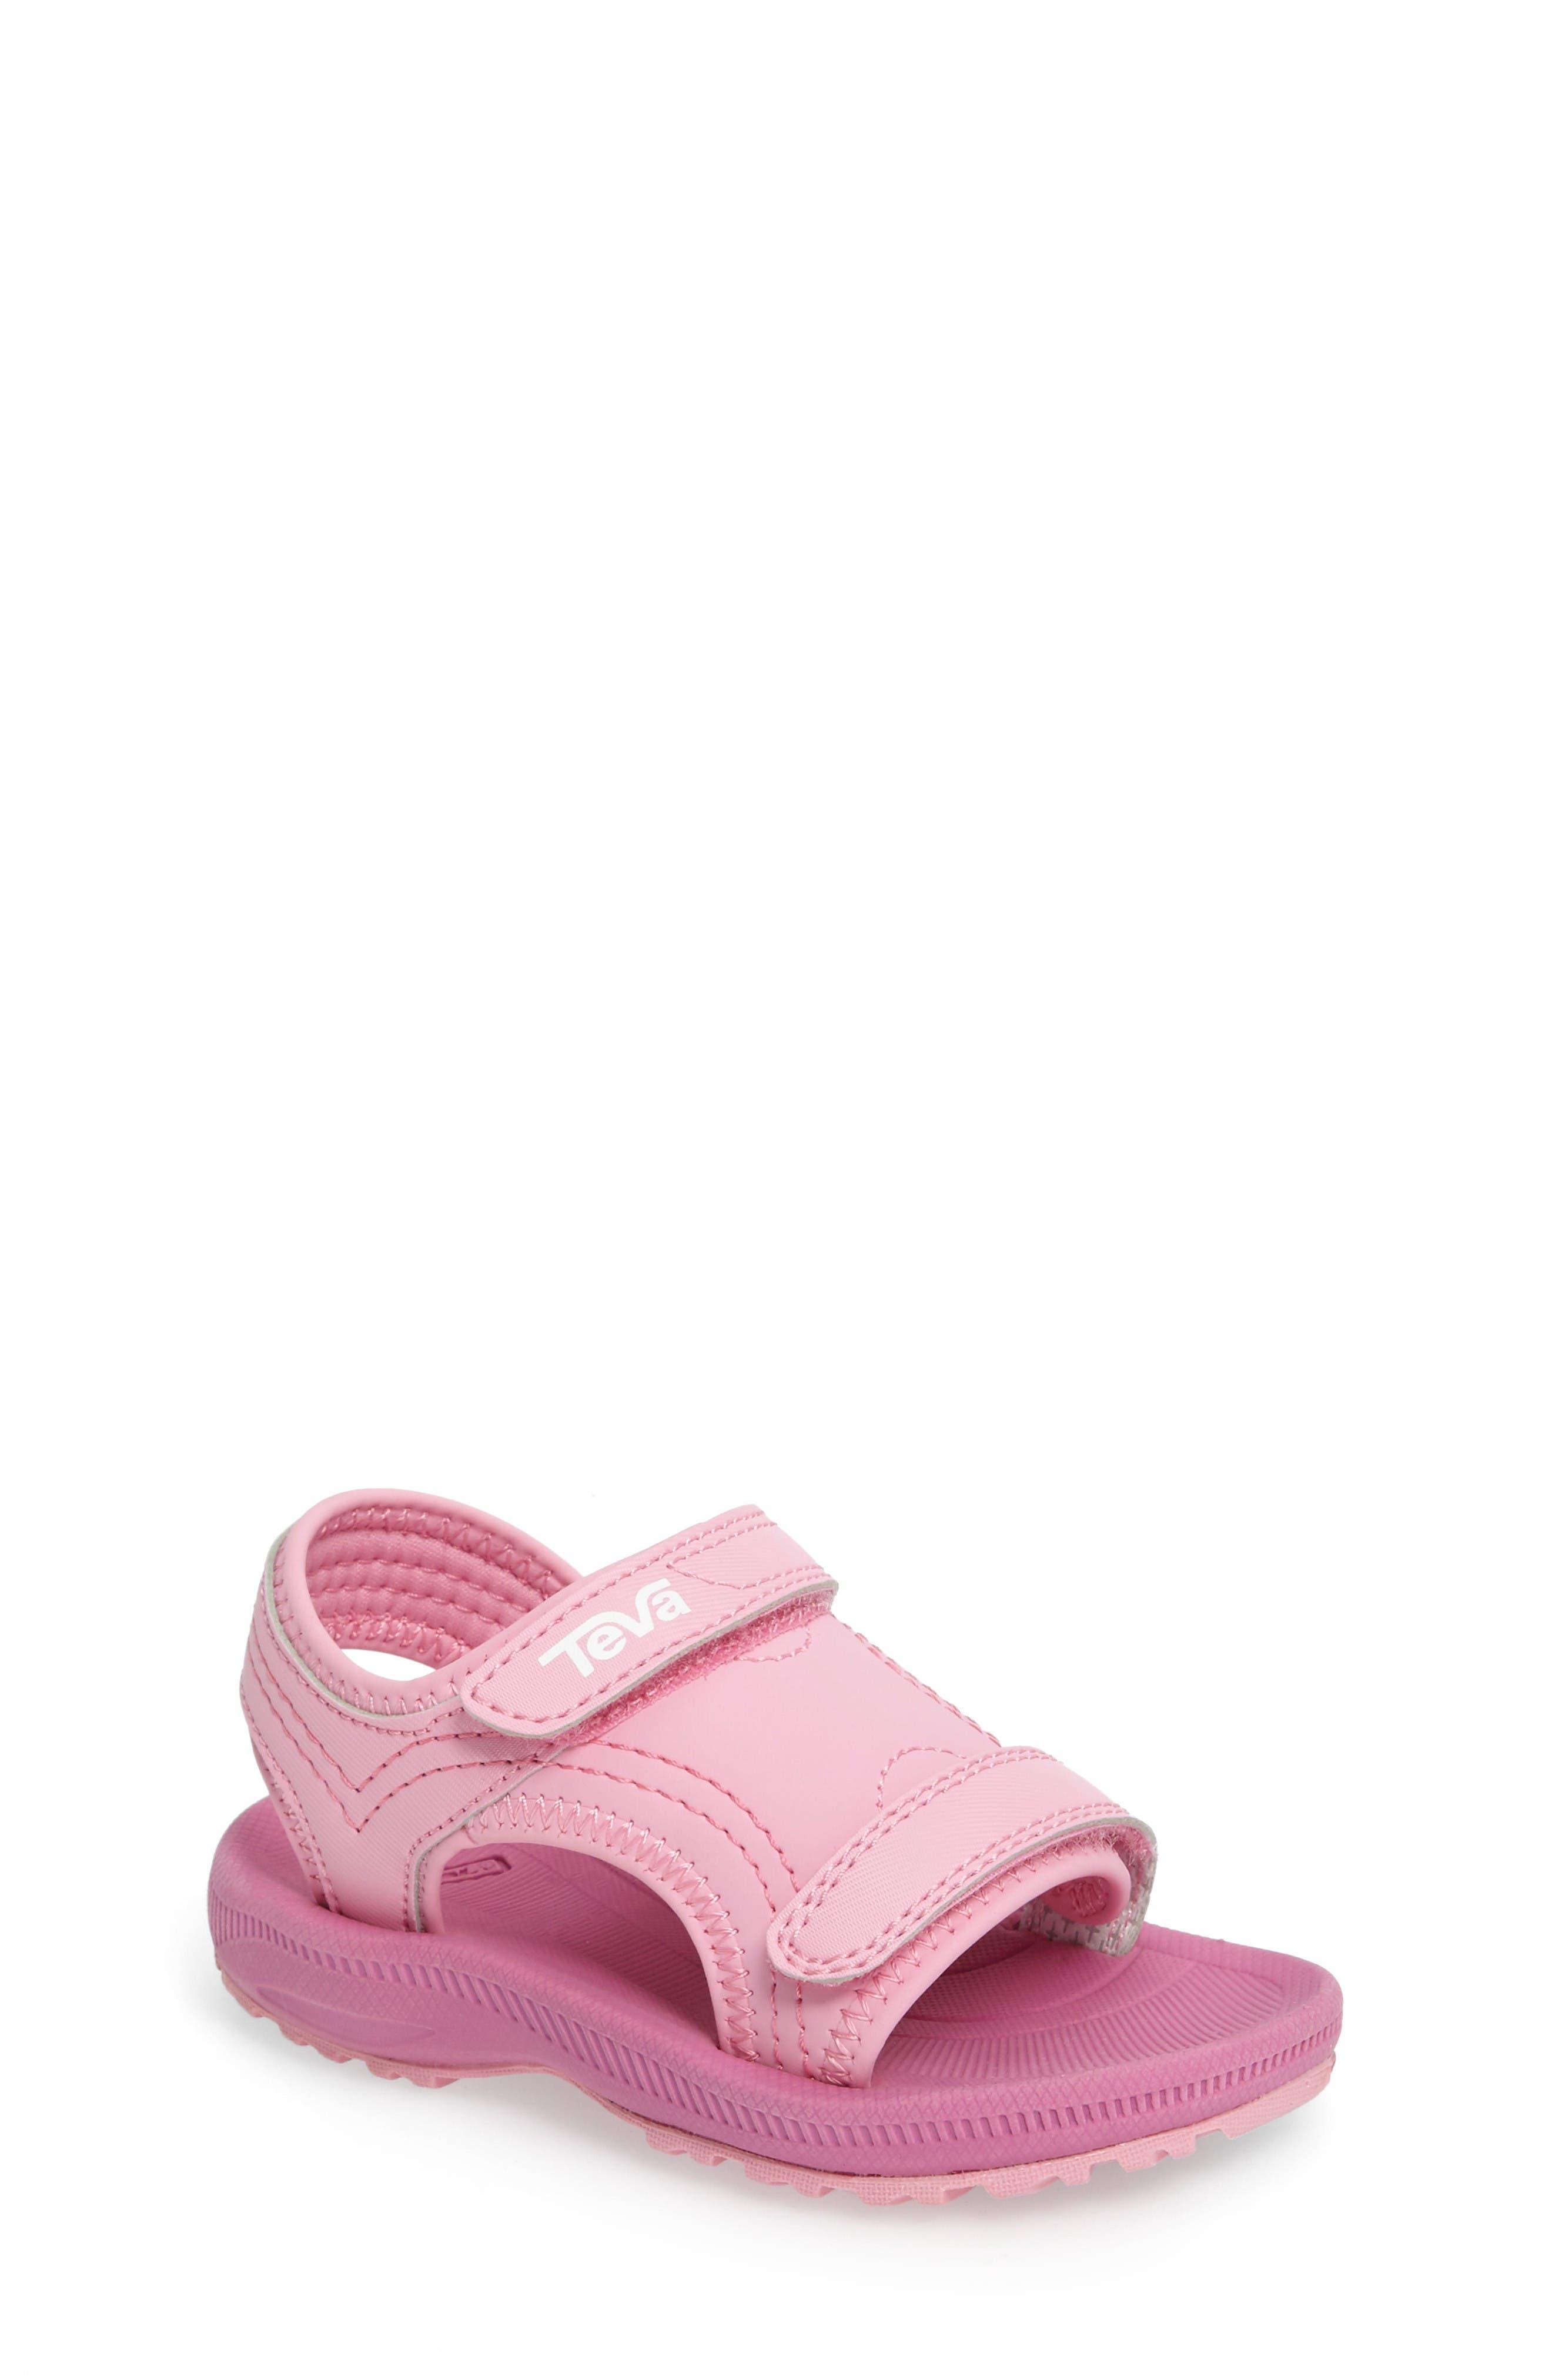 TEVA Psyclone 5 Sandal